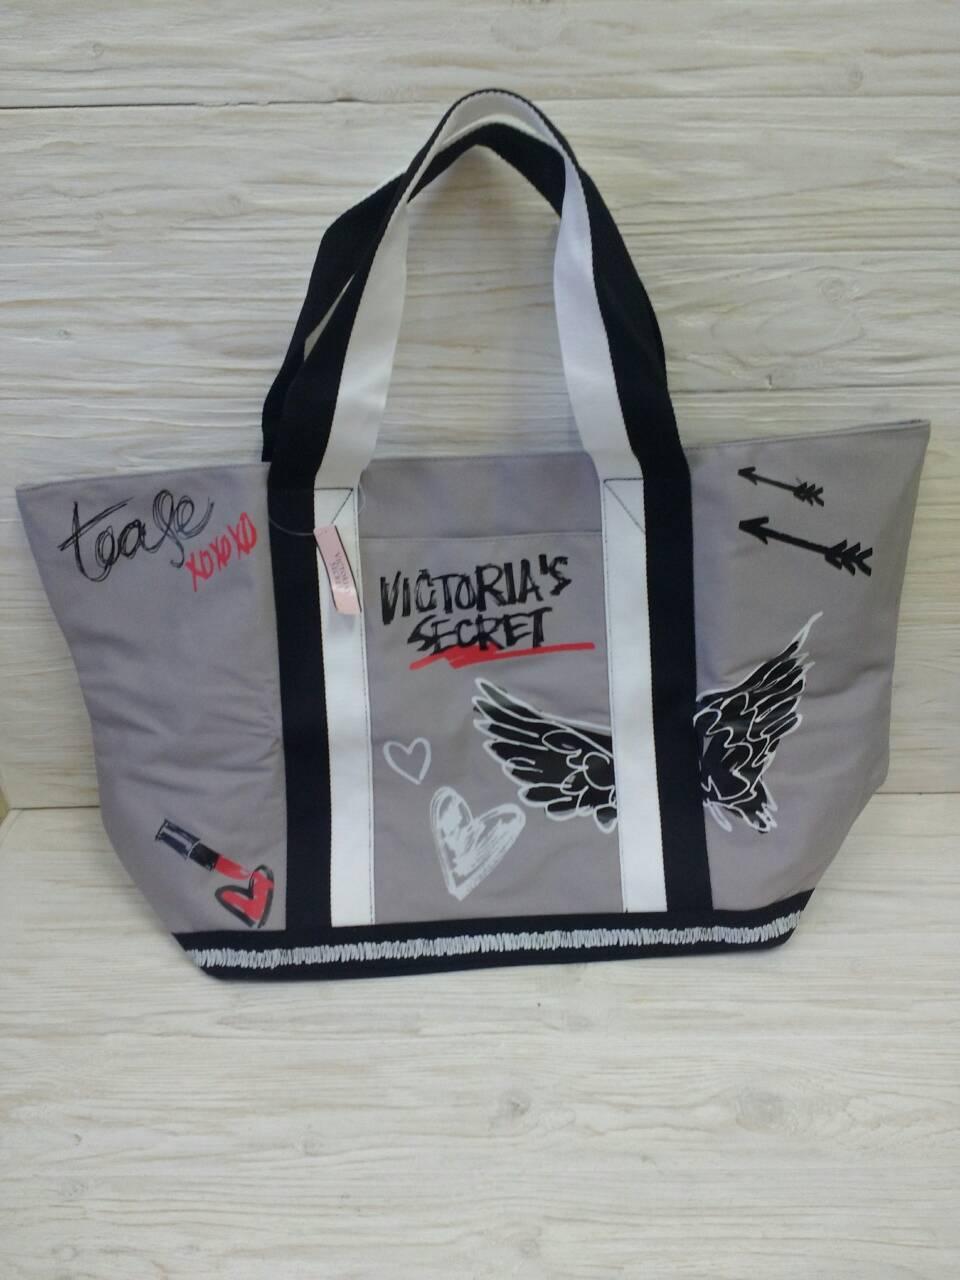 792866adf878a Стильная сумка Victoria's Secret, Виктория Сикрет Оригинал: продажа ...